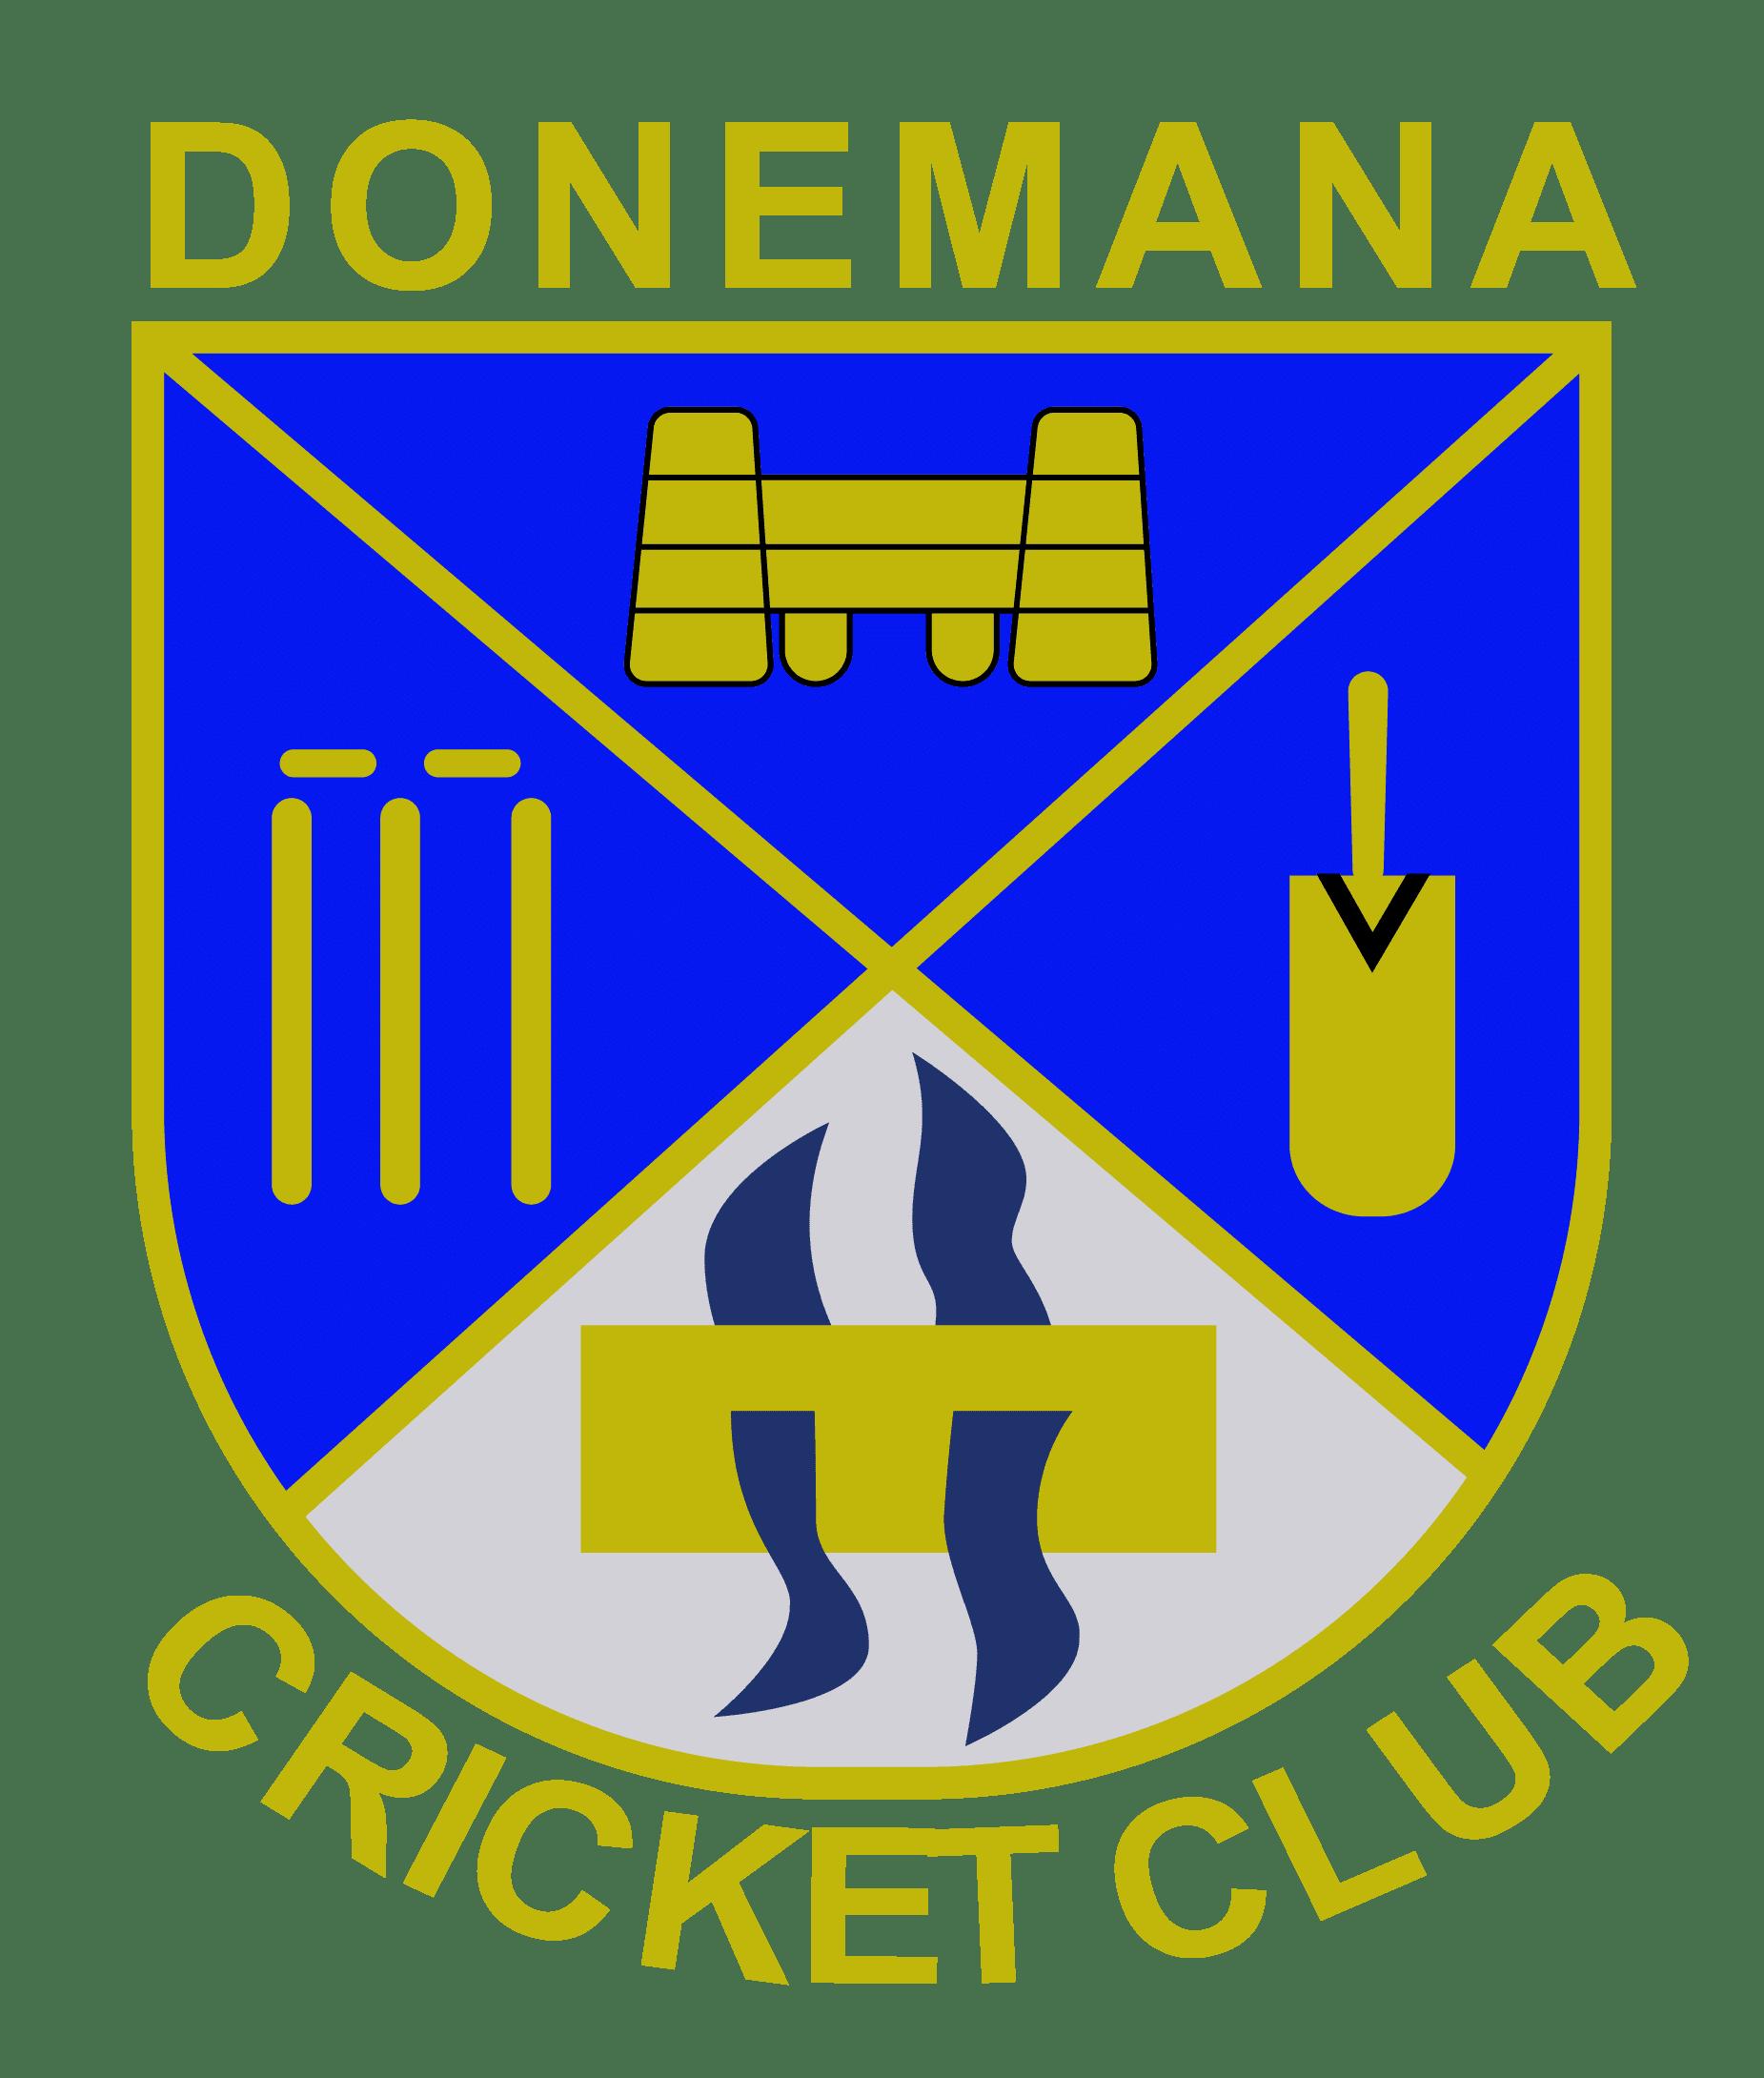 Cricket clipart cricket club. Donemana north west union